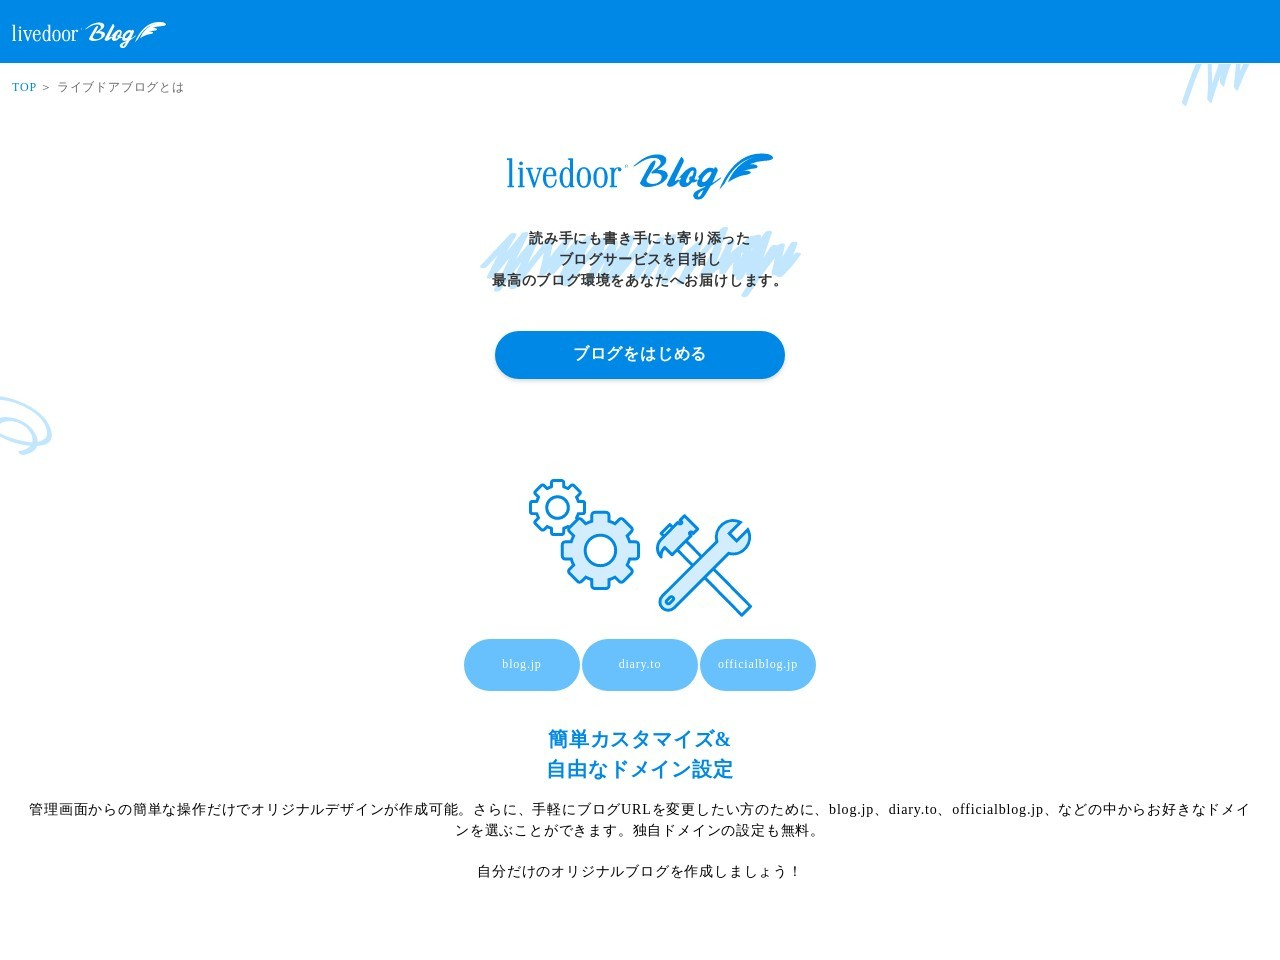 http://blog.livedoor.jp/norehero/%E7%B1%B3%E8%BB%8D%E5%BC%8F%E3%81%9F%E3%81%9F%E3%81%BF%E6%96%B9